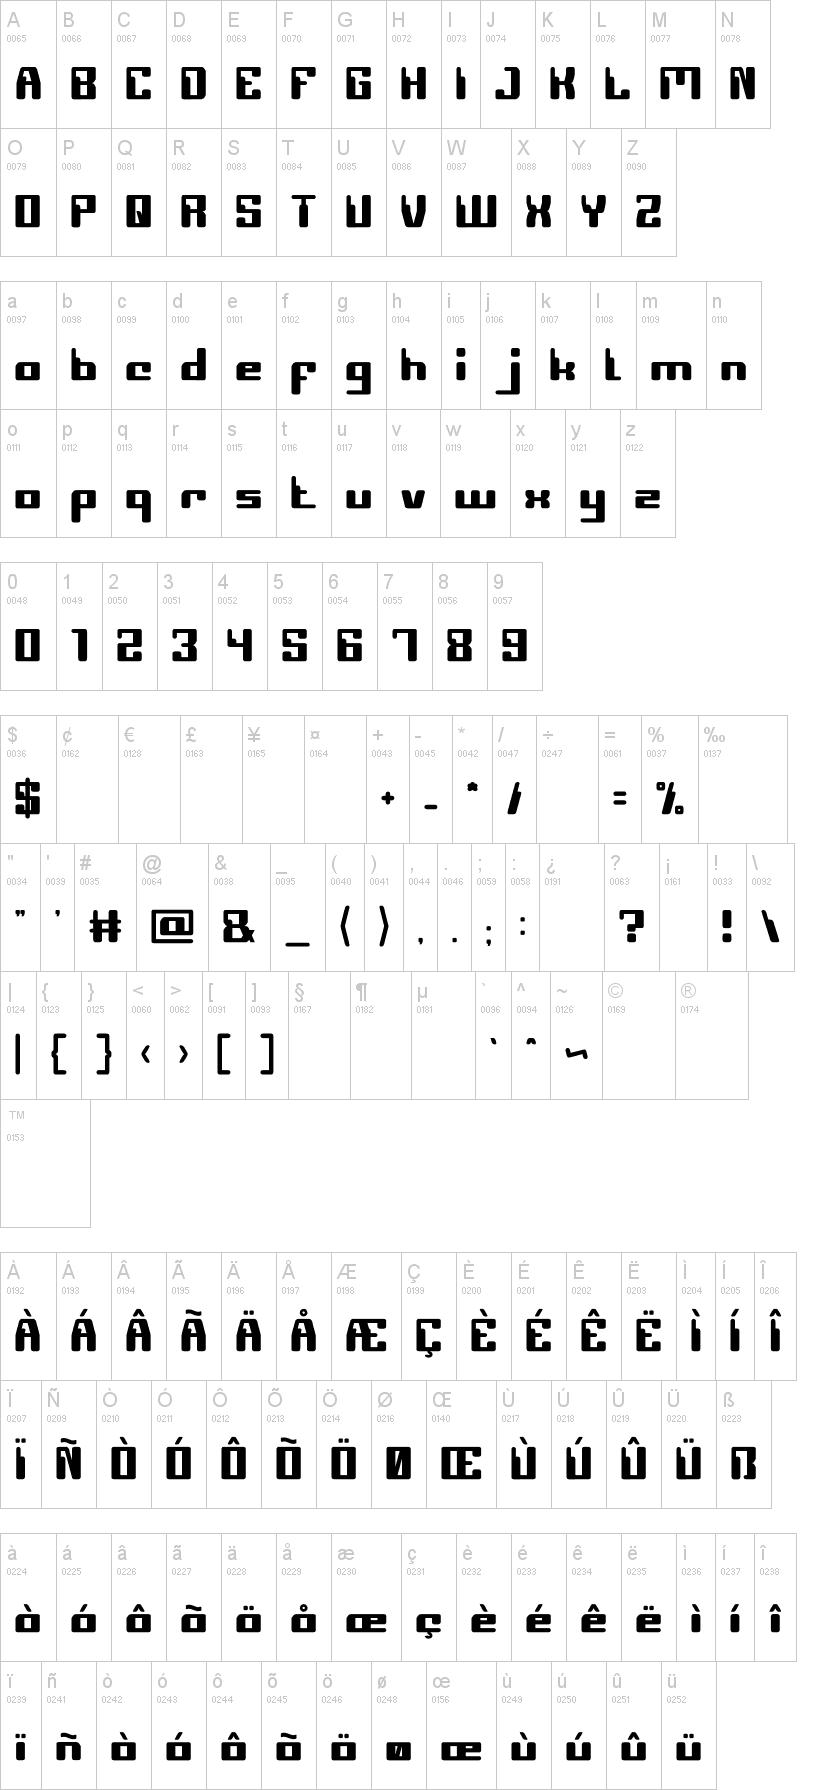 Similar Fonts To Mr Robot